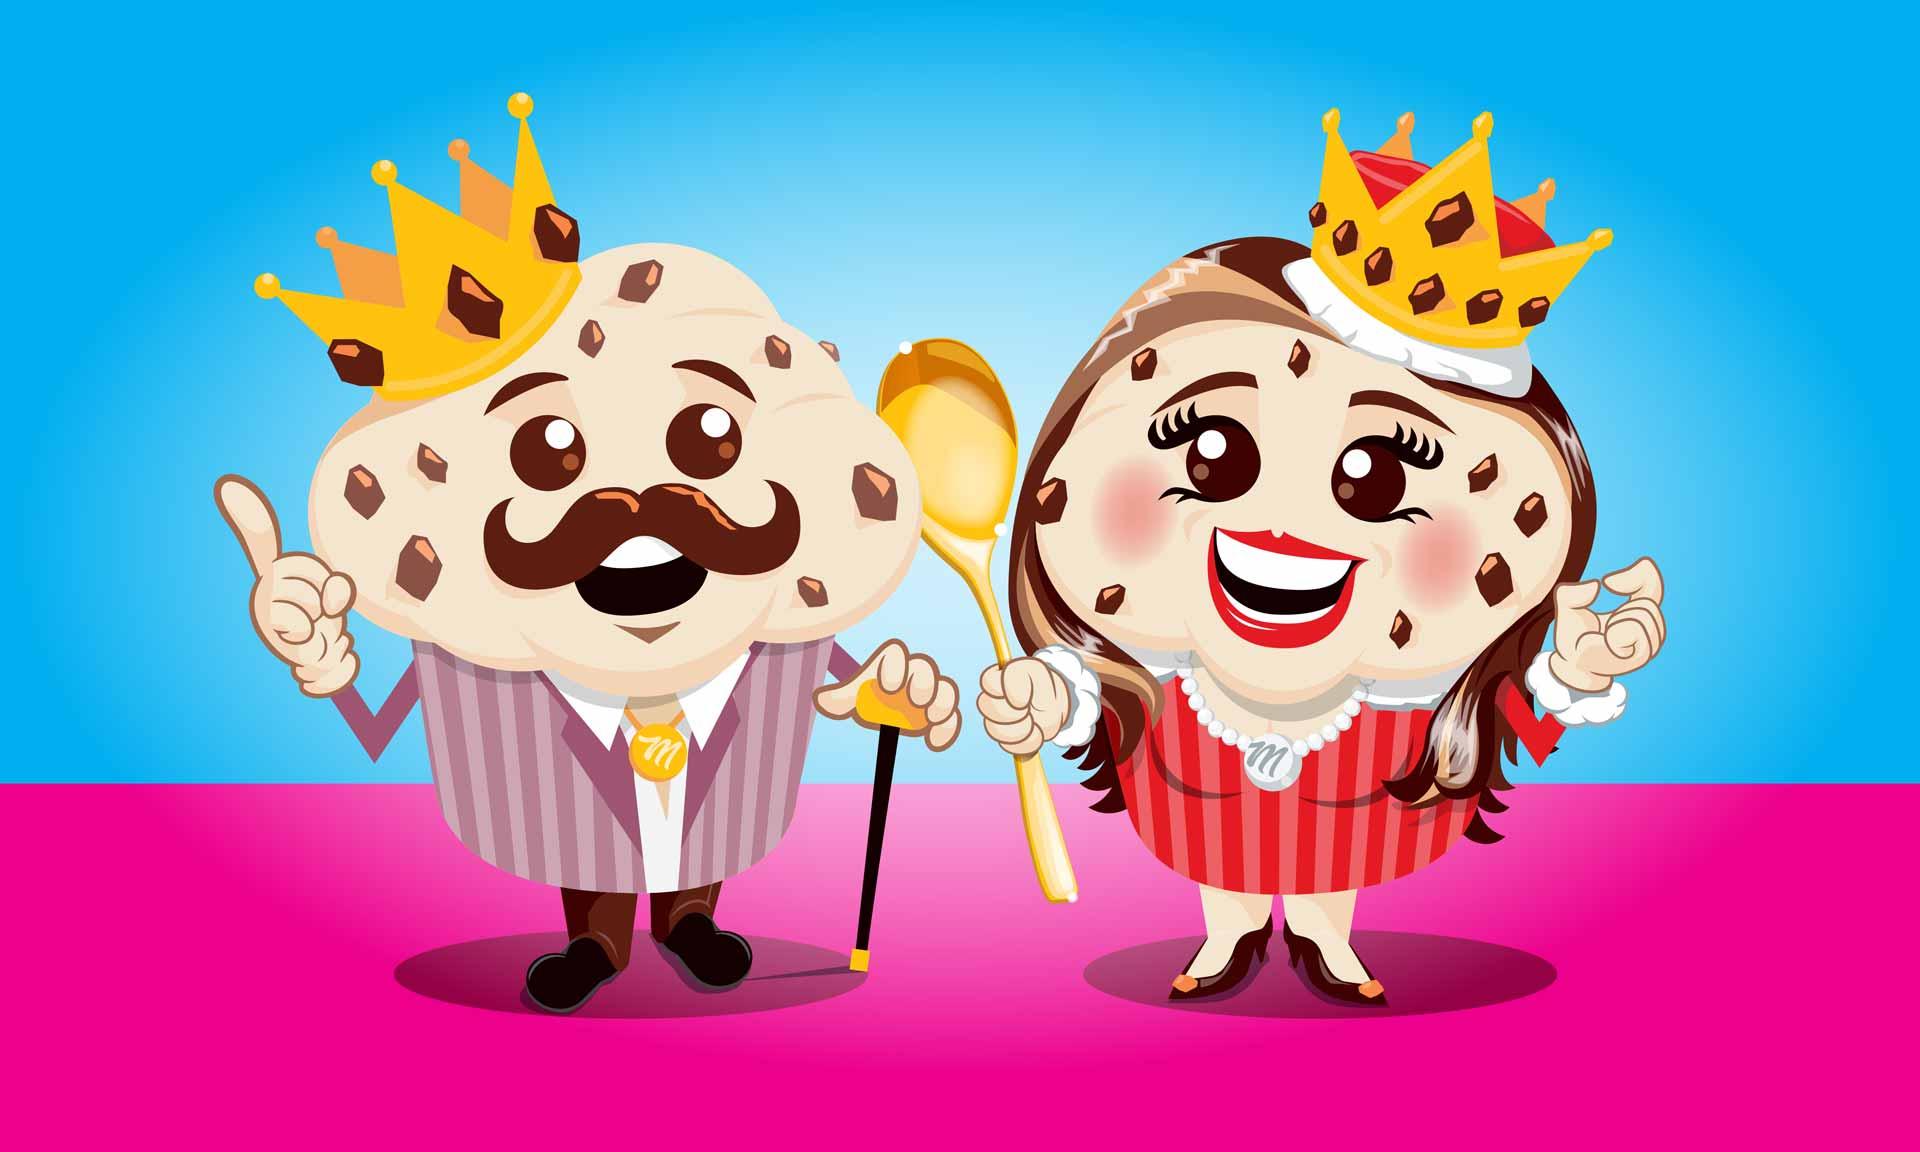 Mr and Mrs Muffin Cartoon Artwork design